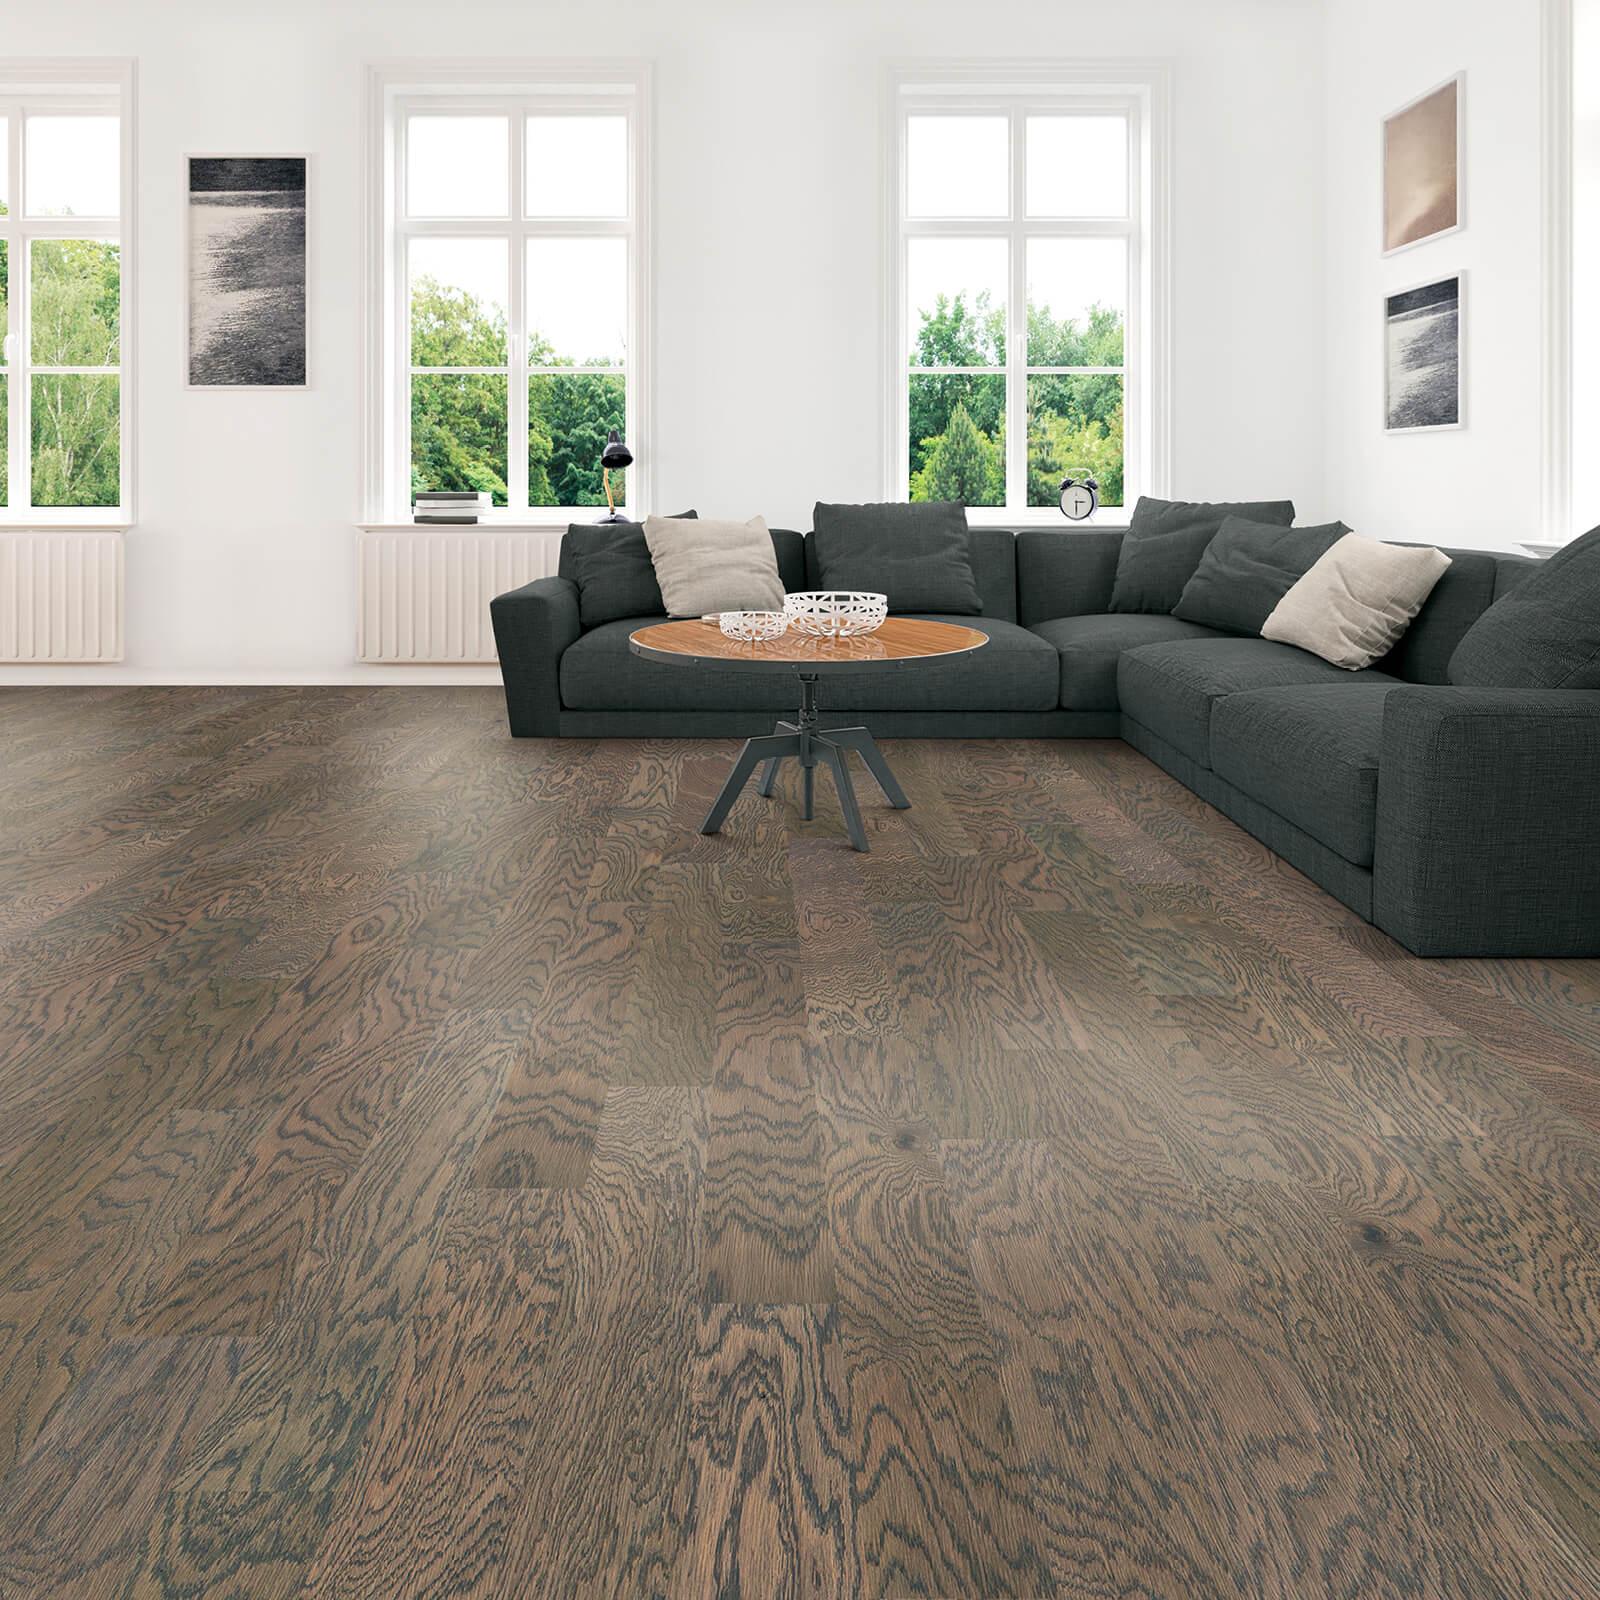 Spring valley   McSwain Carpet & Floors